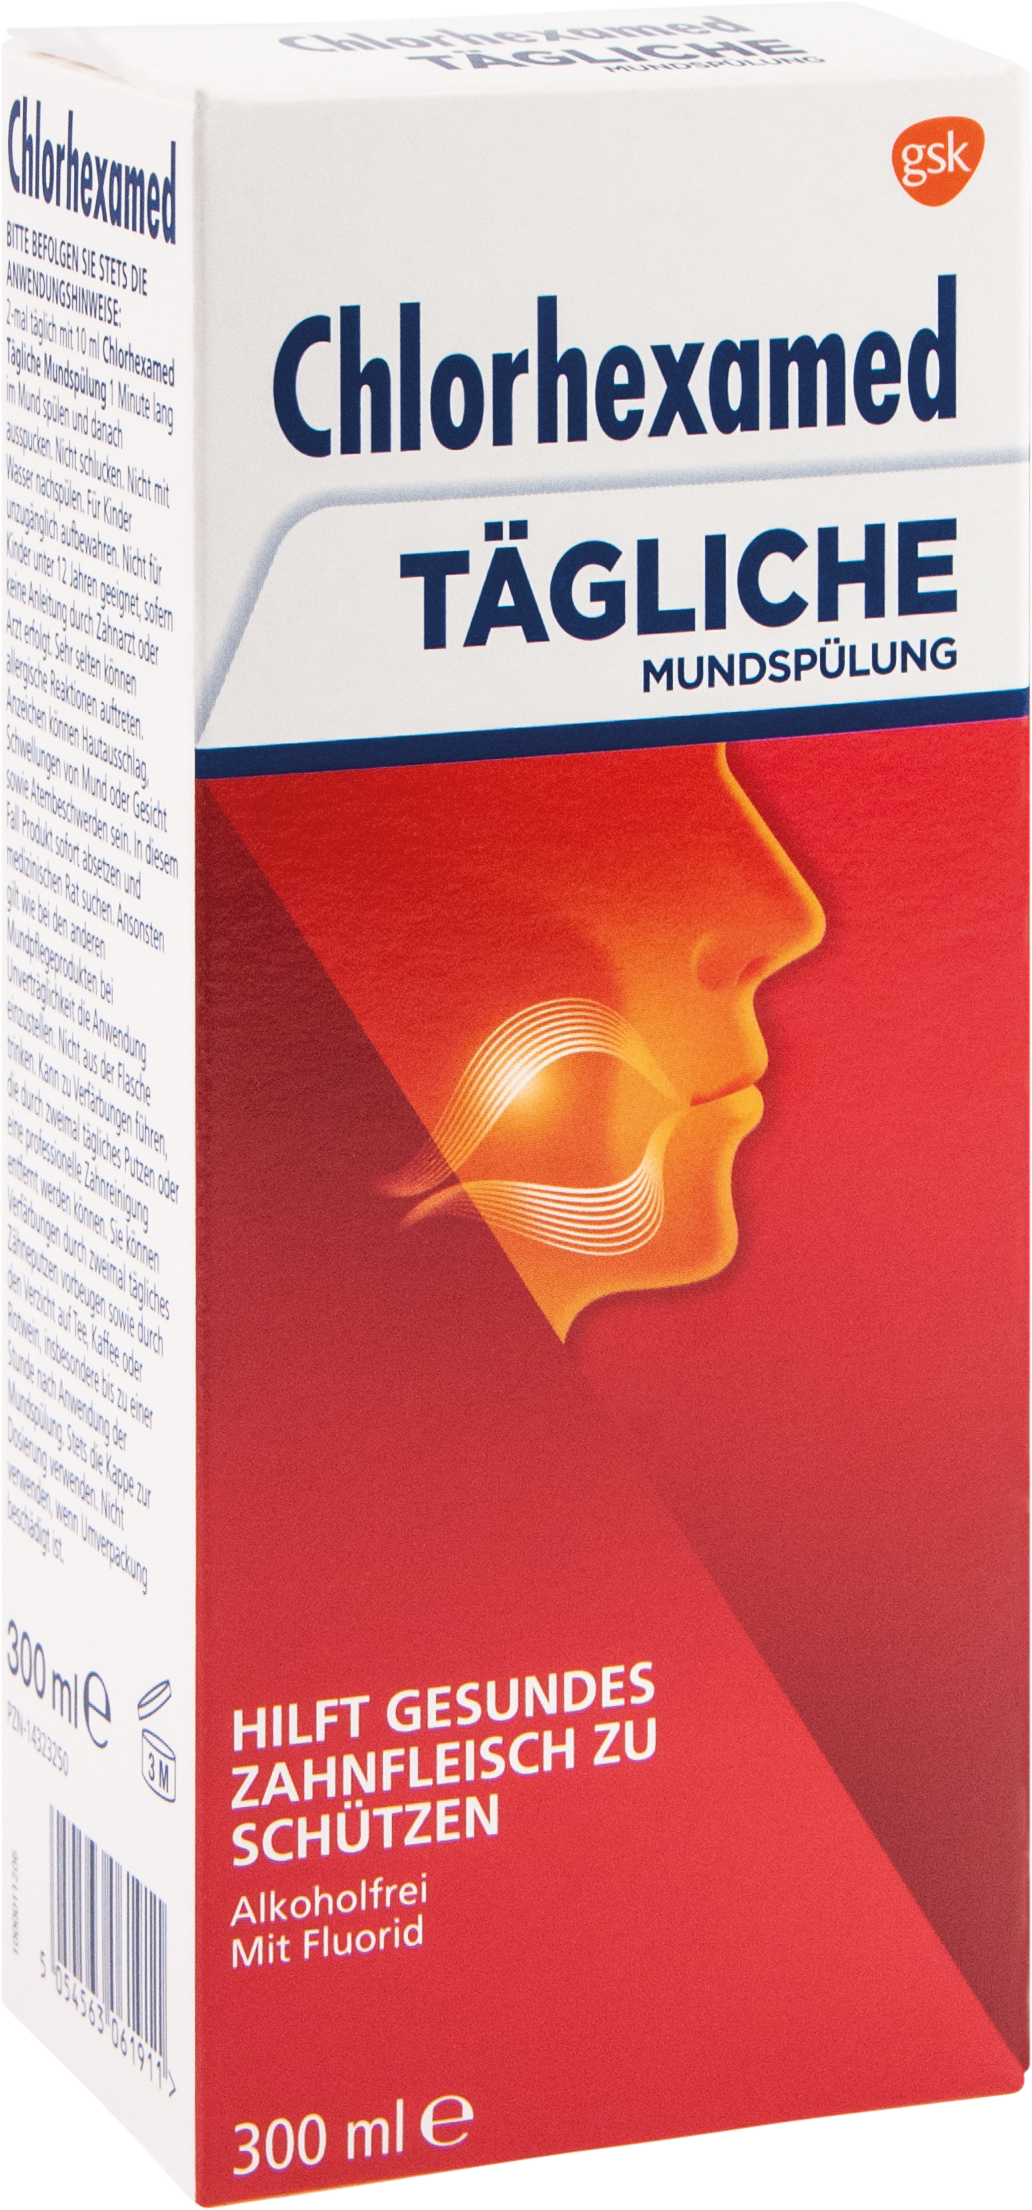 Chlorhexamed Tgl. Mundspu. 0.06%